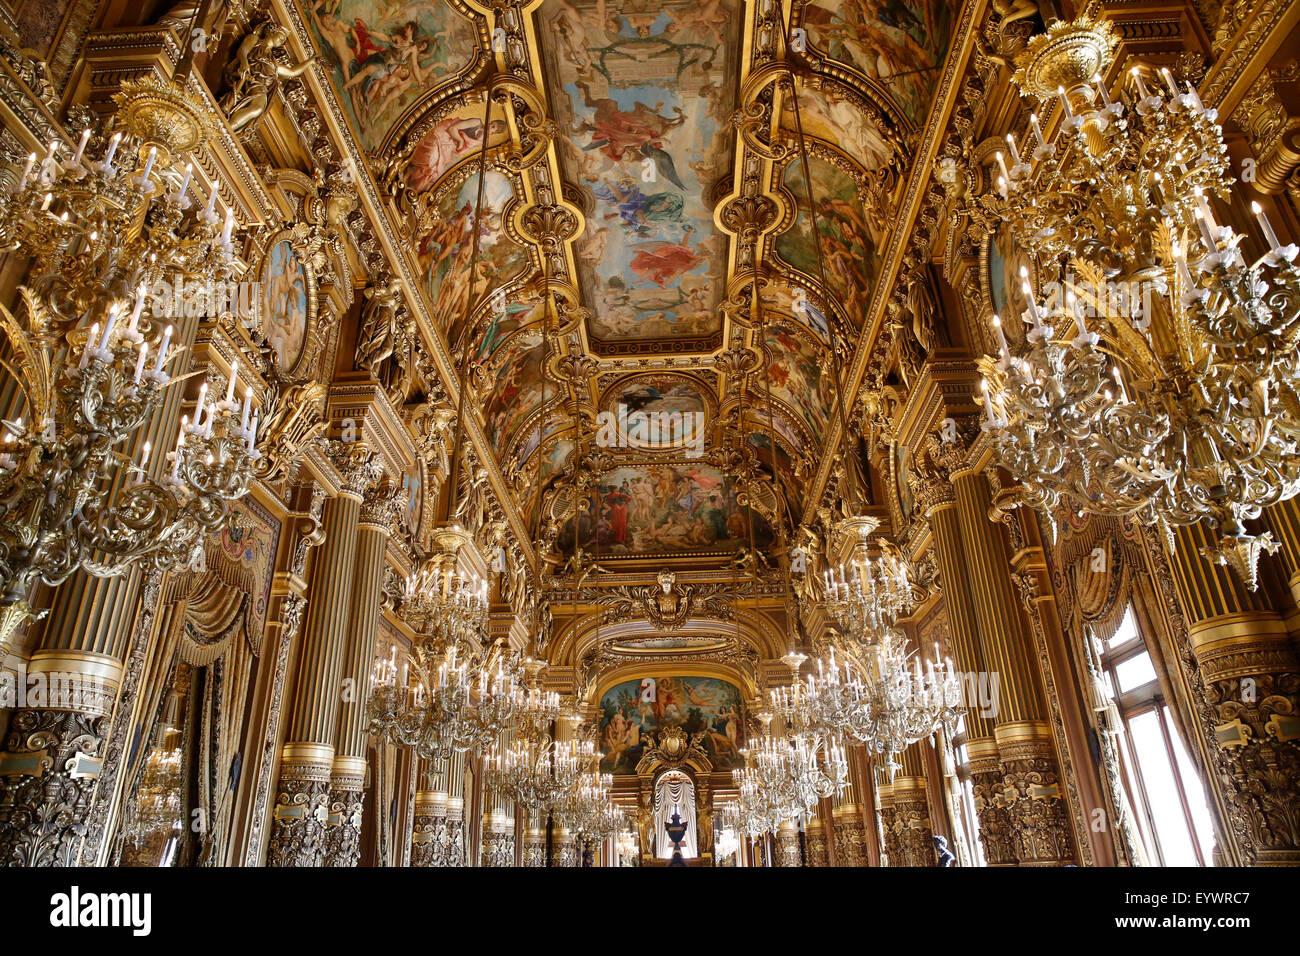 Celling of the Grand Foyer, Paris Opera, Palais Garnier, Paris, France, Europe - Stock Image